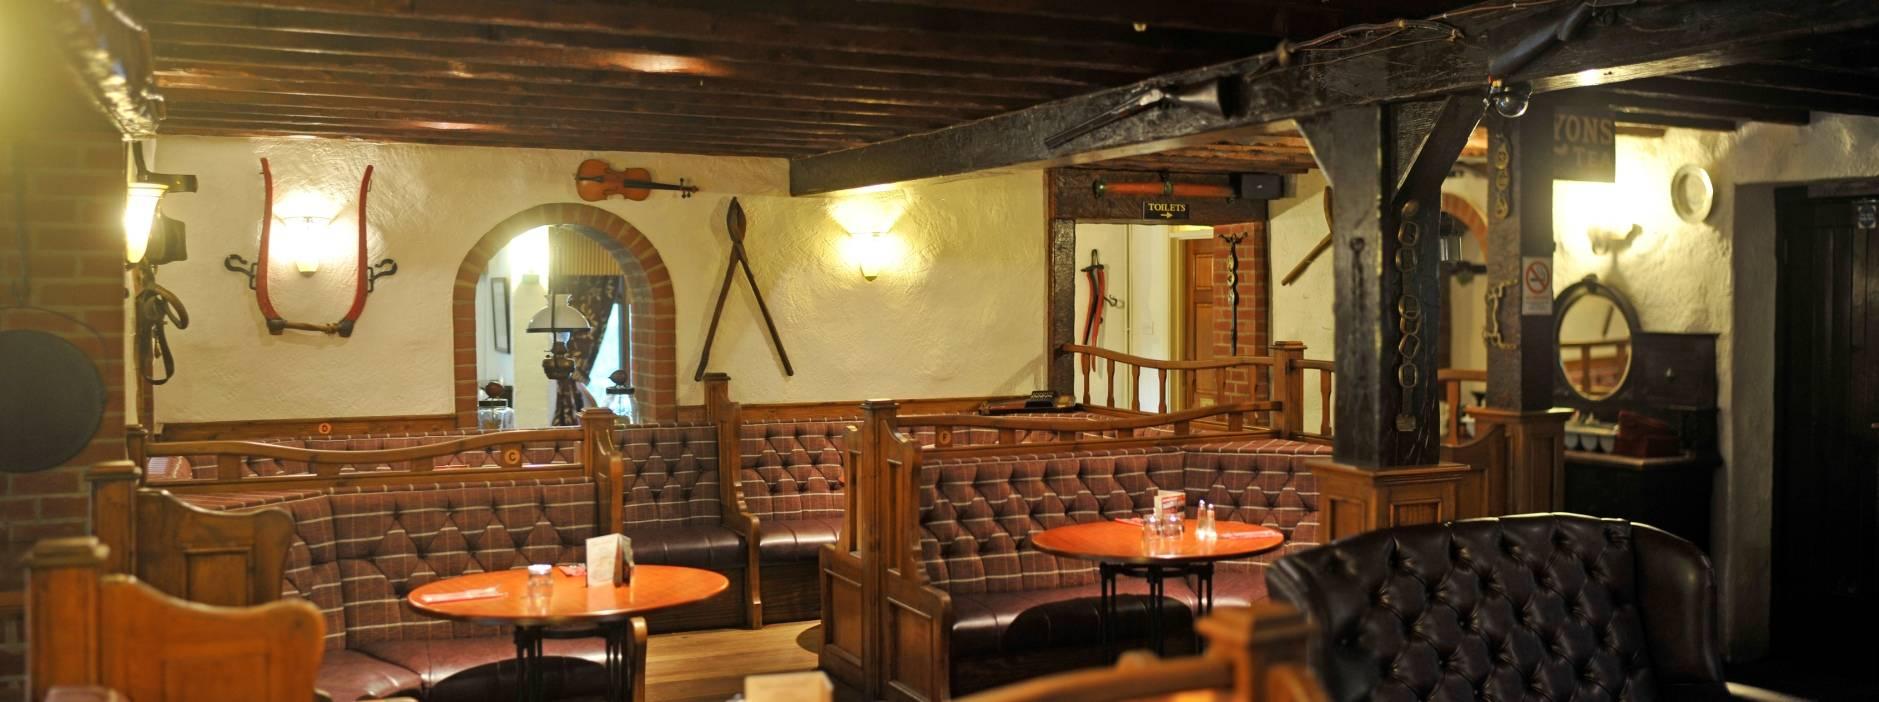 Restaurant Coleraine Bushtown Hotel